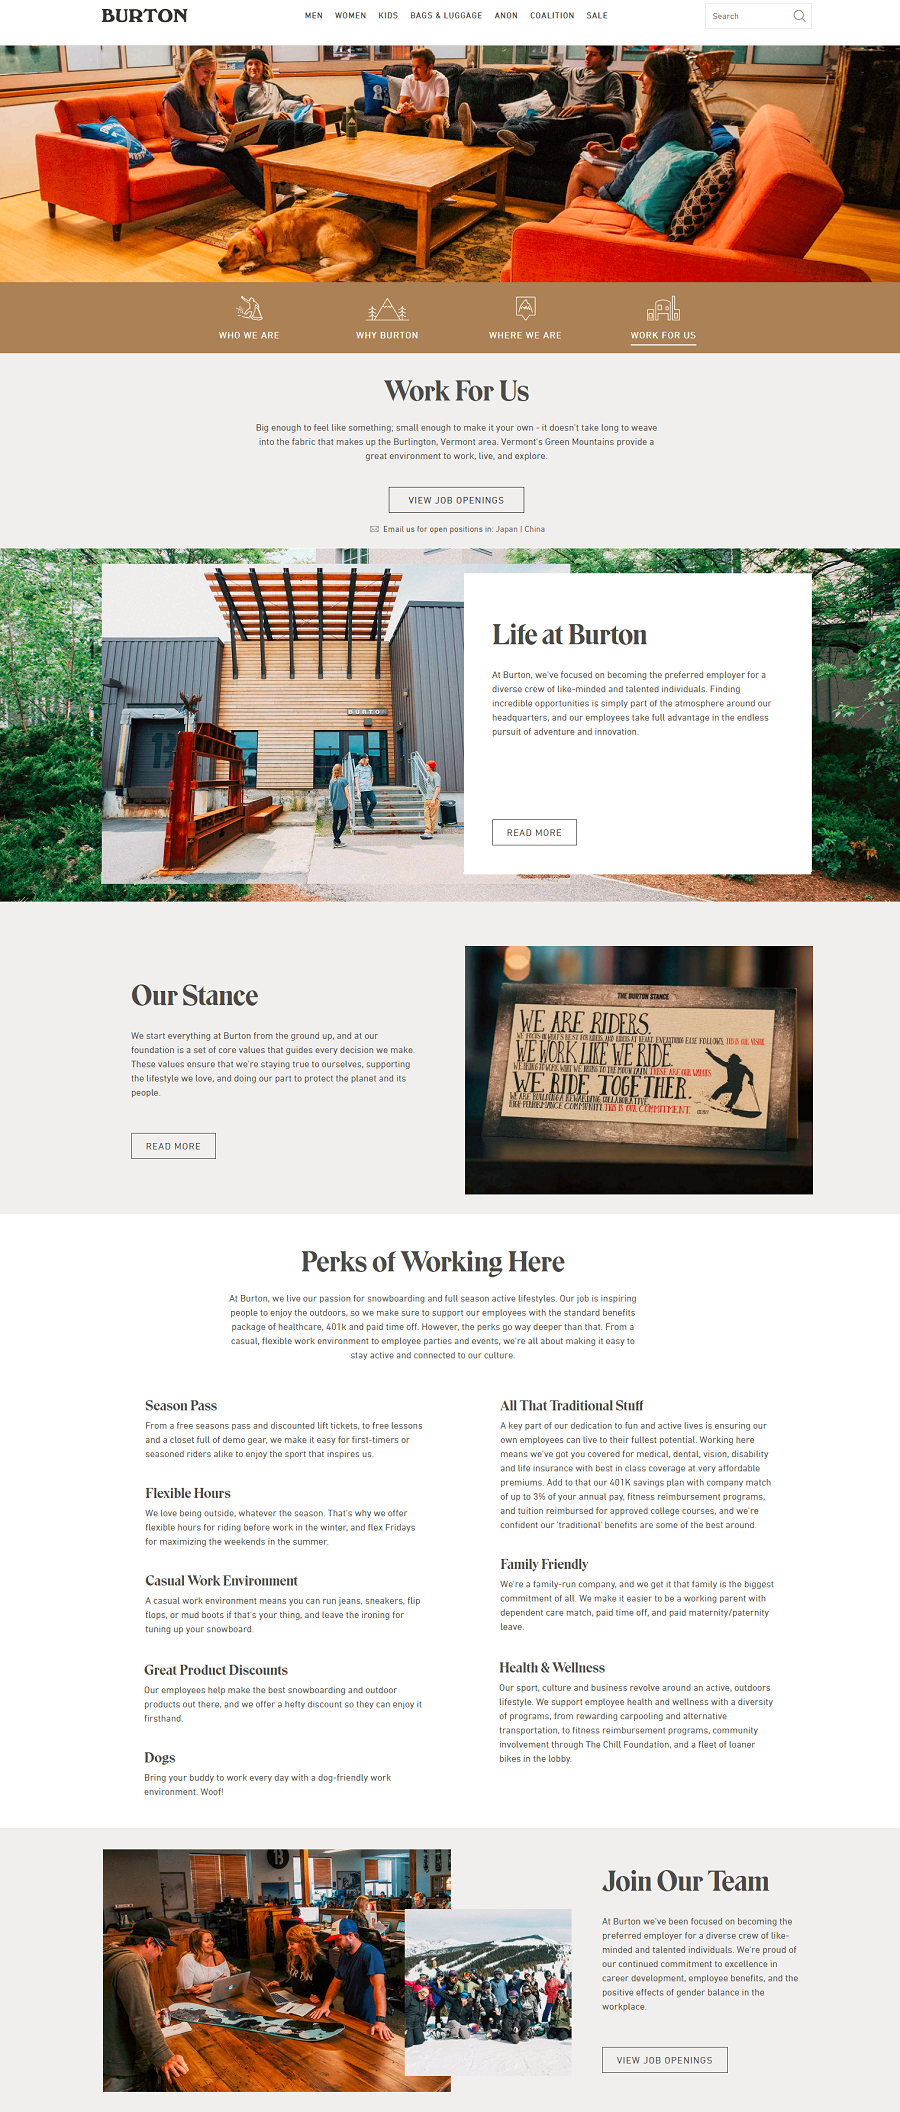 Burton Company Career Site